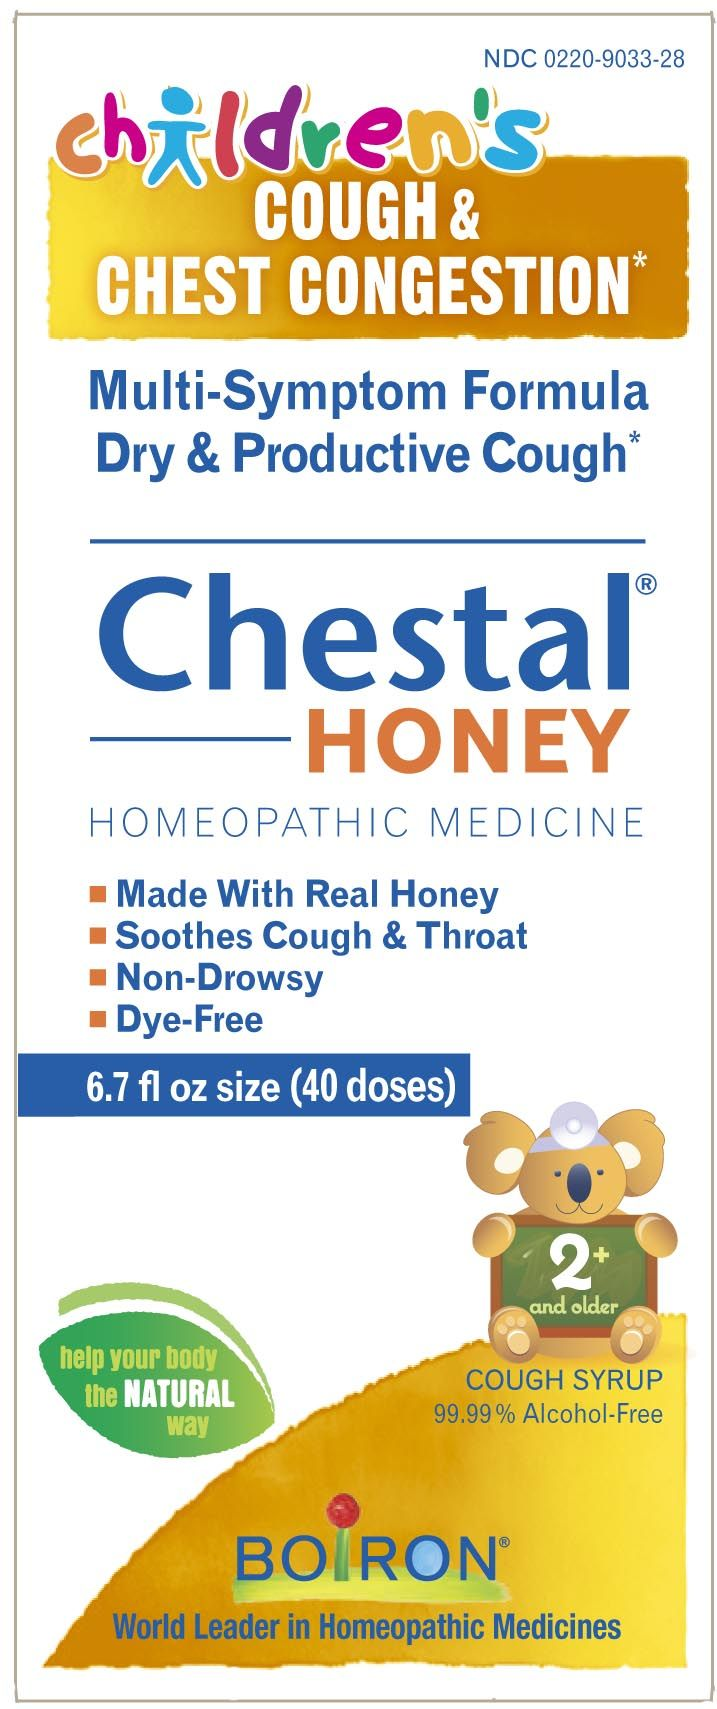 Children's Chestal® Honey Chest congestion, Cough